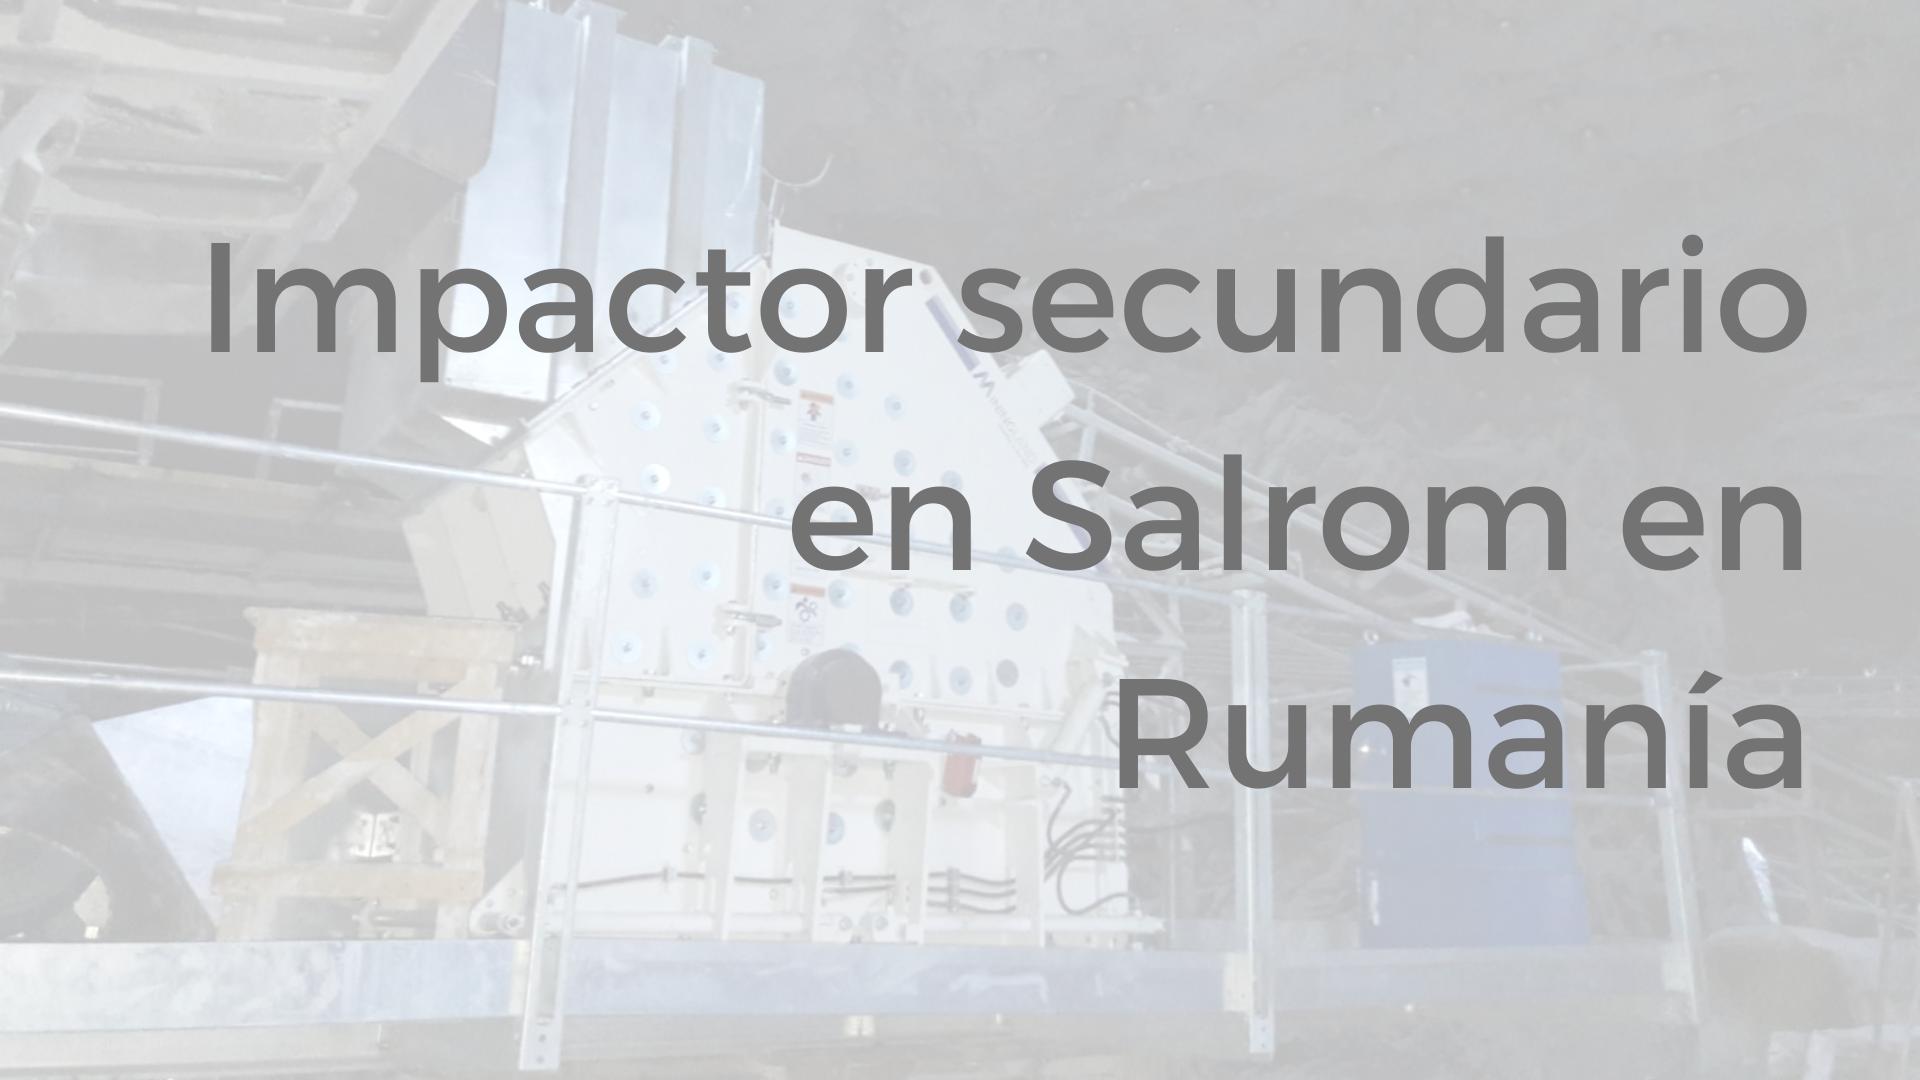 impactor secundario Miningland en Rumania